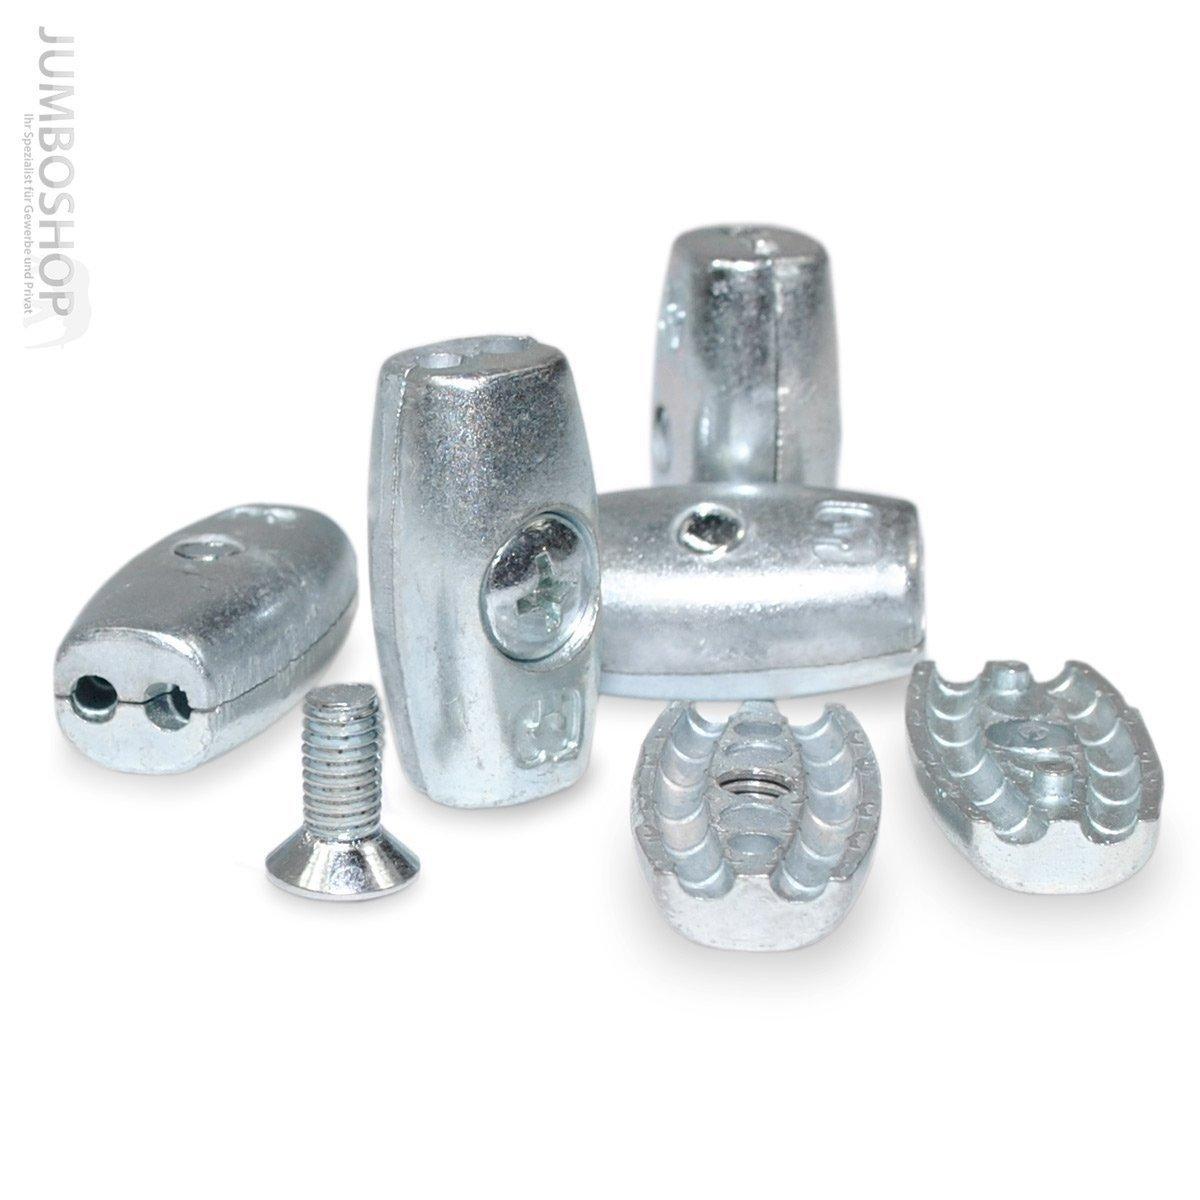 Drahtseilklemme EIFORM 6mm Seilklemmen Aluminium | Eiform Klemmen ...